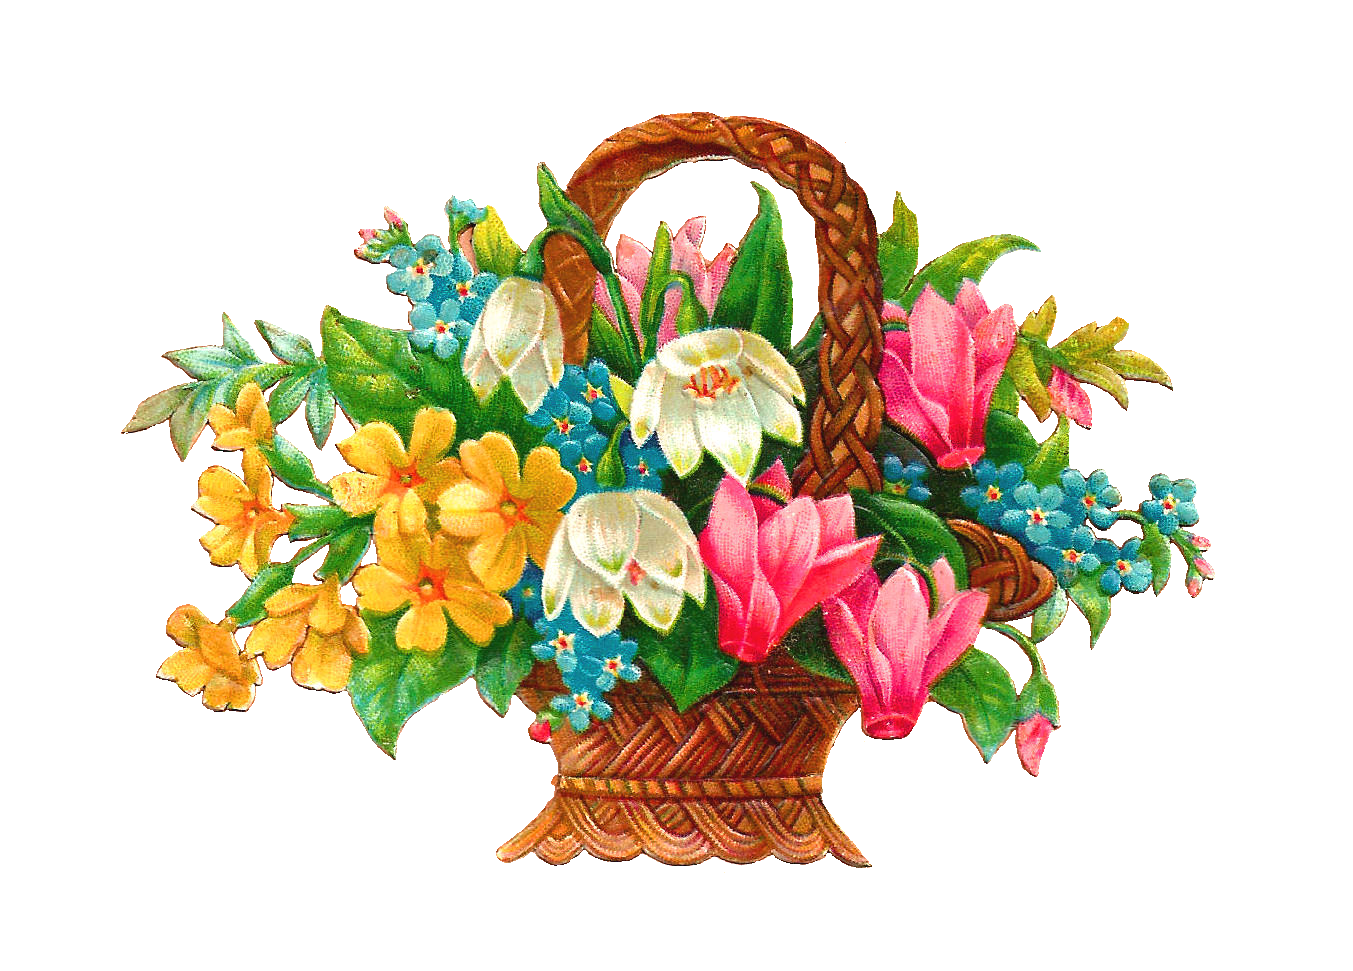 Antique Free Flower Basket Clip Art 2 Wicket Baskets Full of Wild Fl